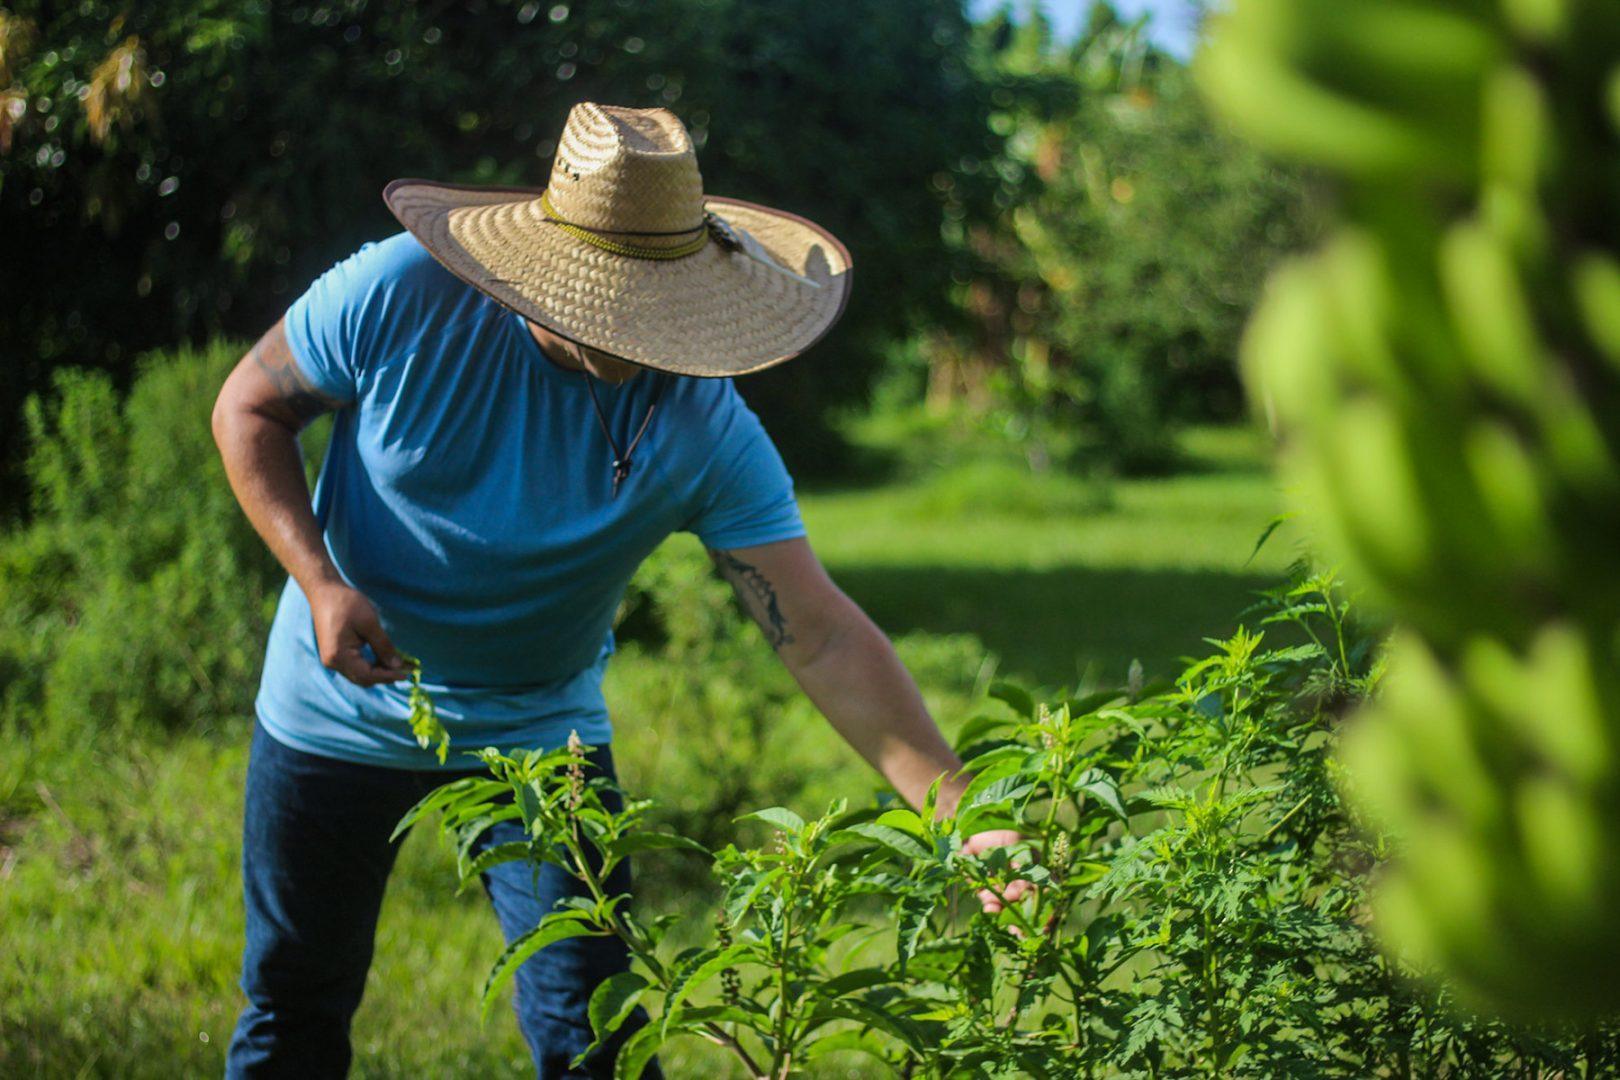 Farmer Jon picking from bushes in the Eckerd College garden